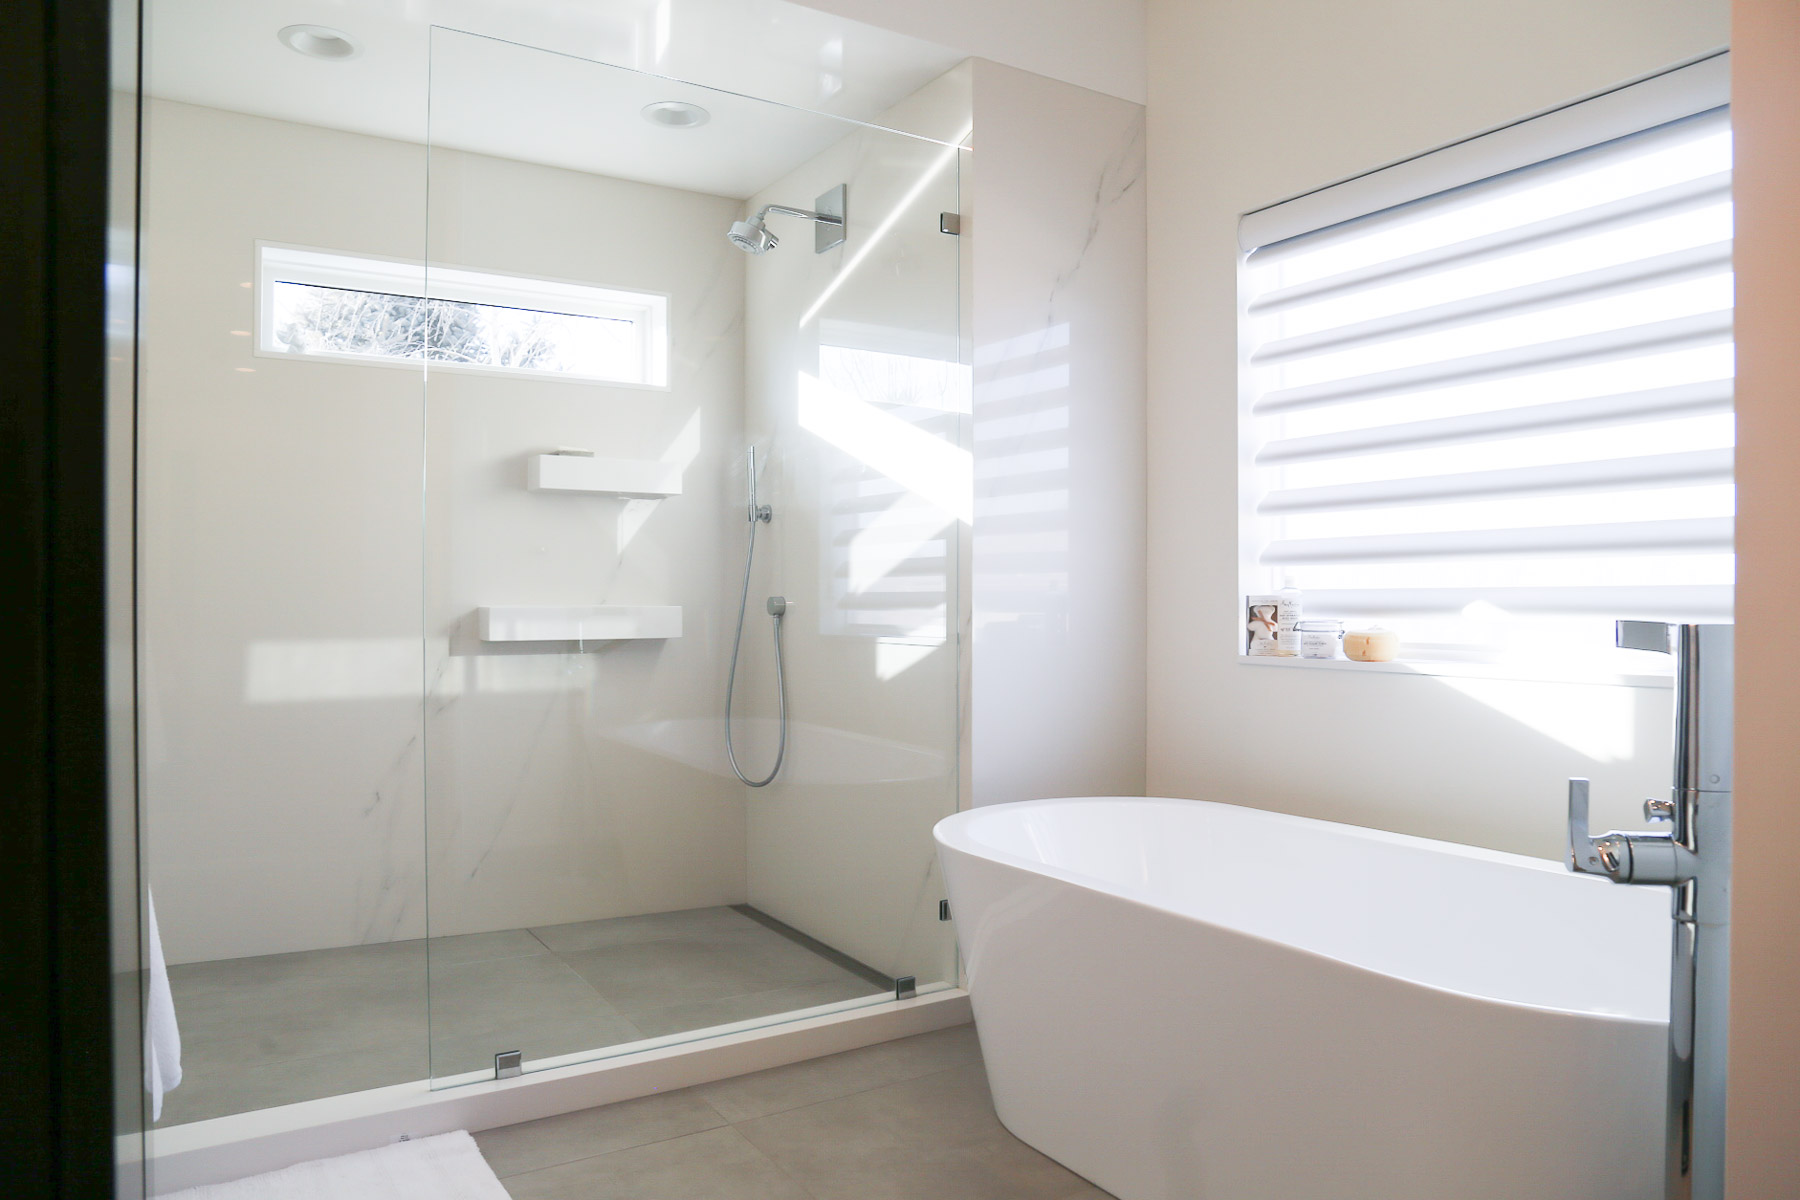 Bathroom-22.JPG